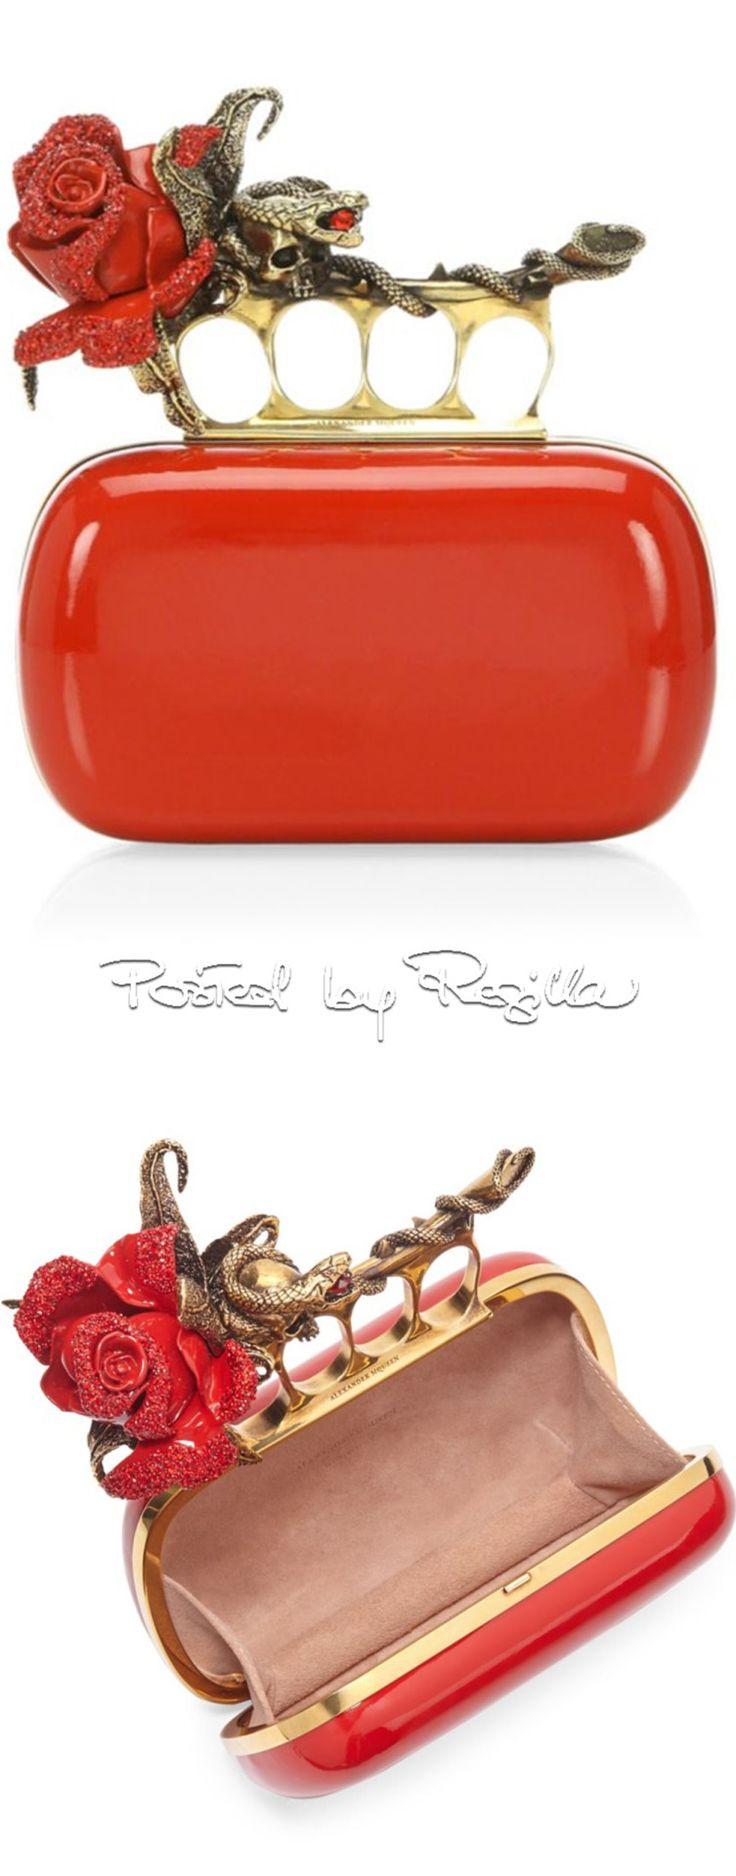 Regilla ⚜ Alexander McQueen, Red Rose Four Ring Clutch